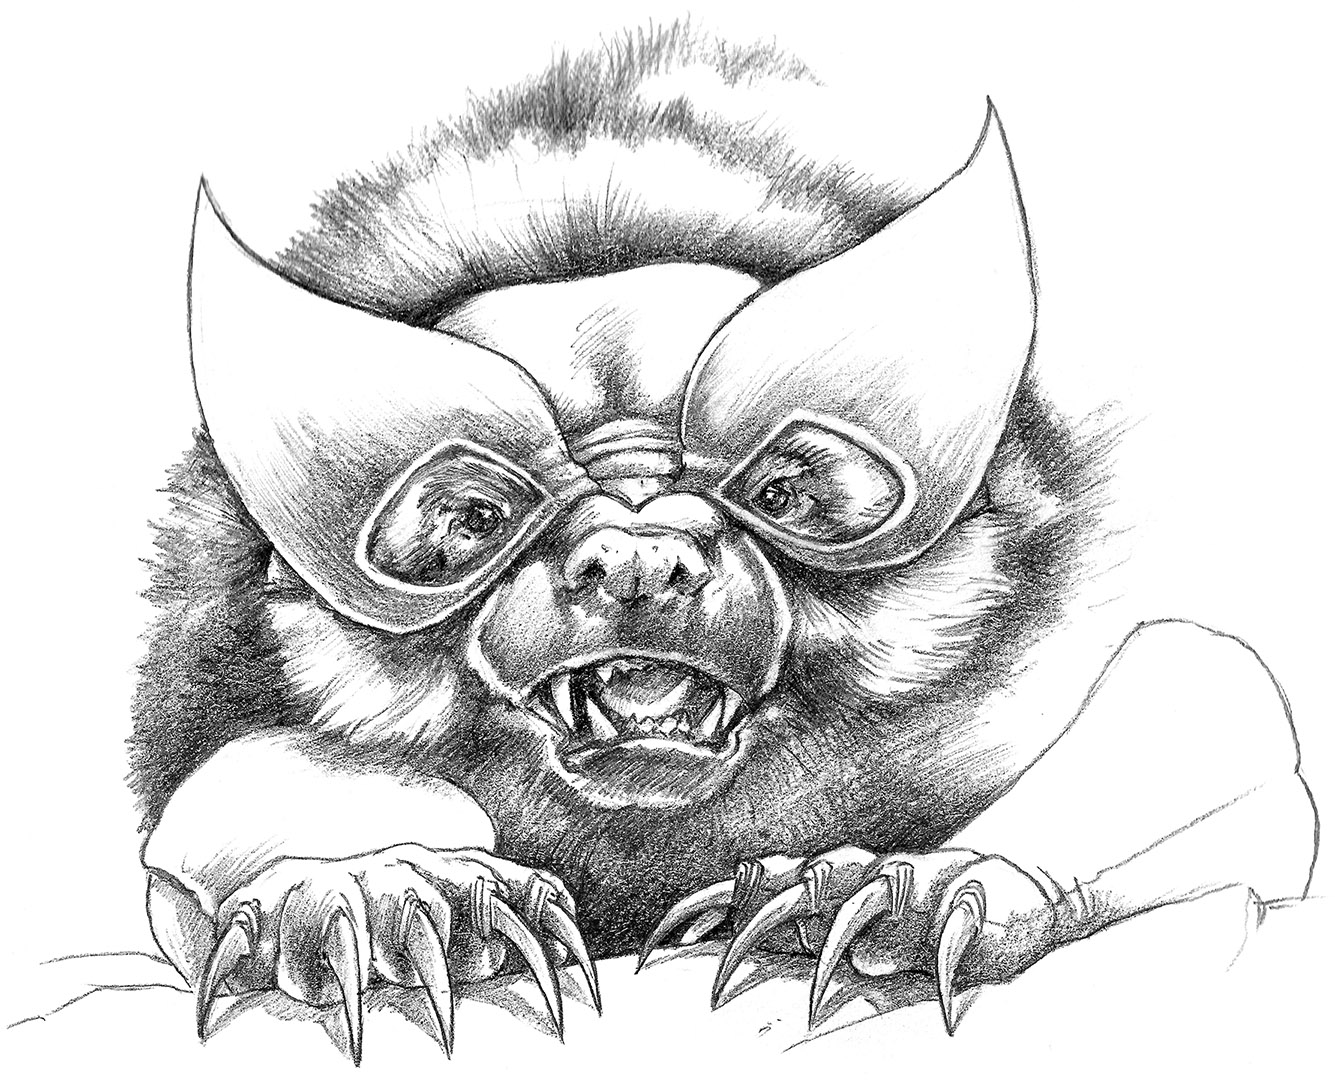 Wolverine_Sketch2.jpg